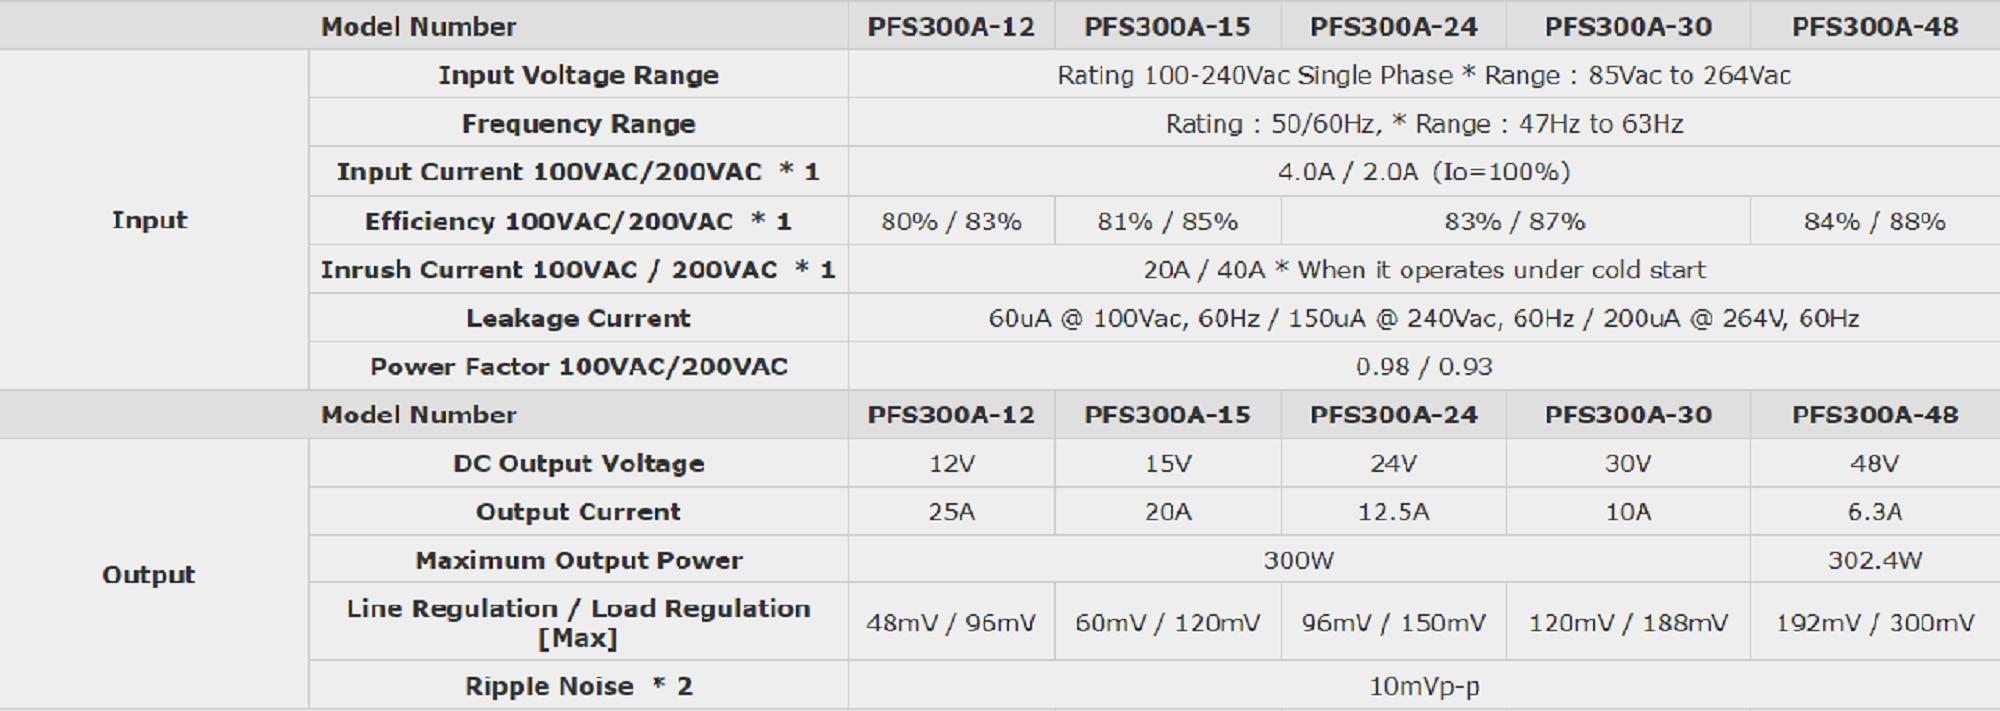 PFS300A PSU specs